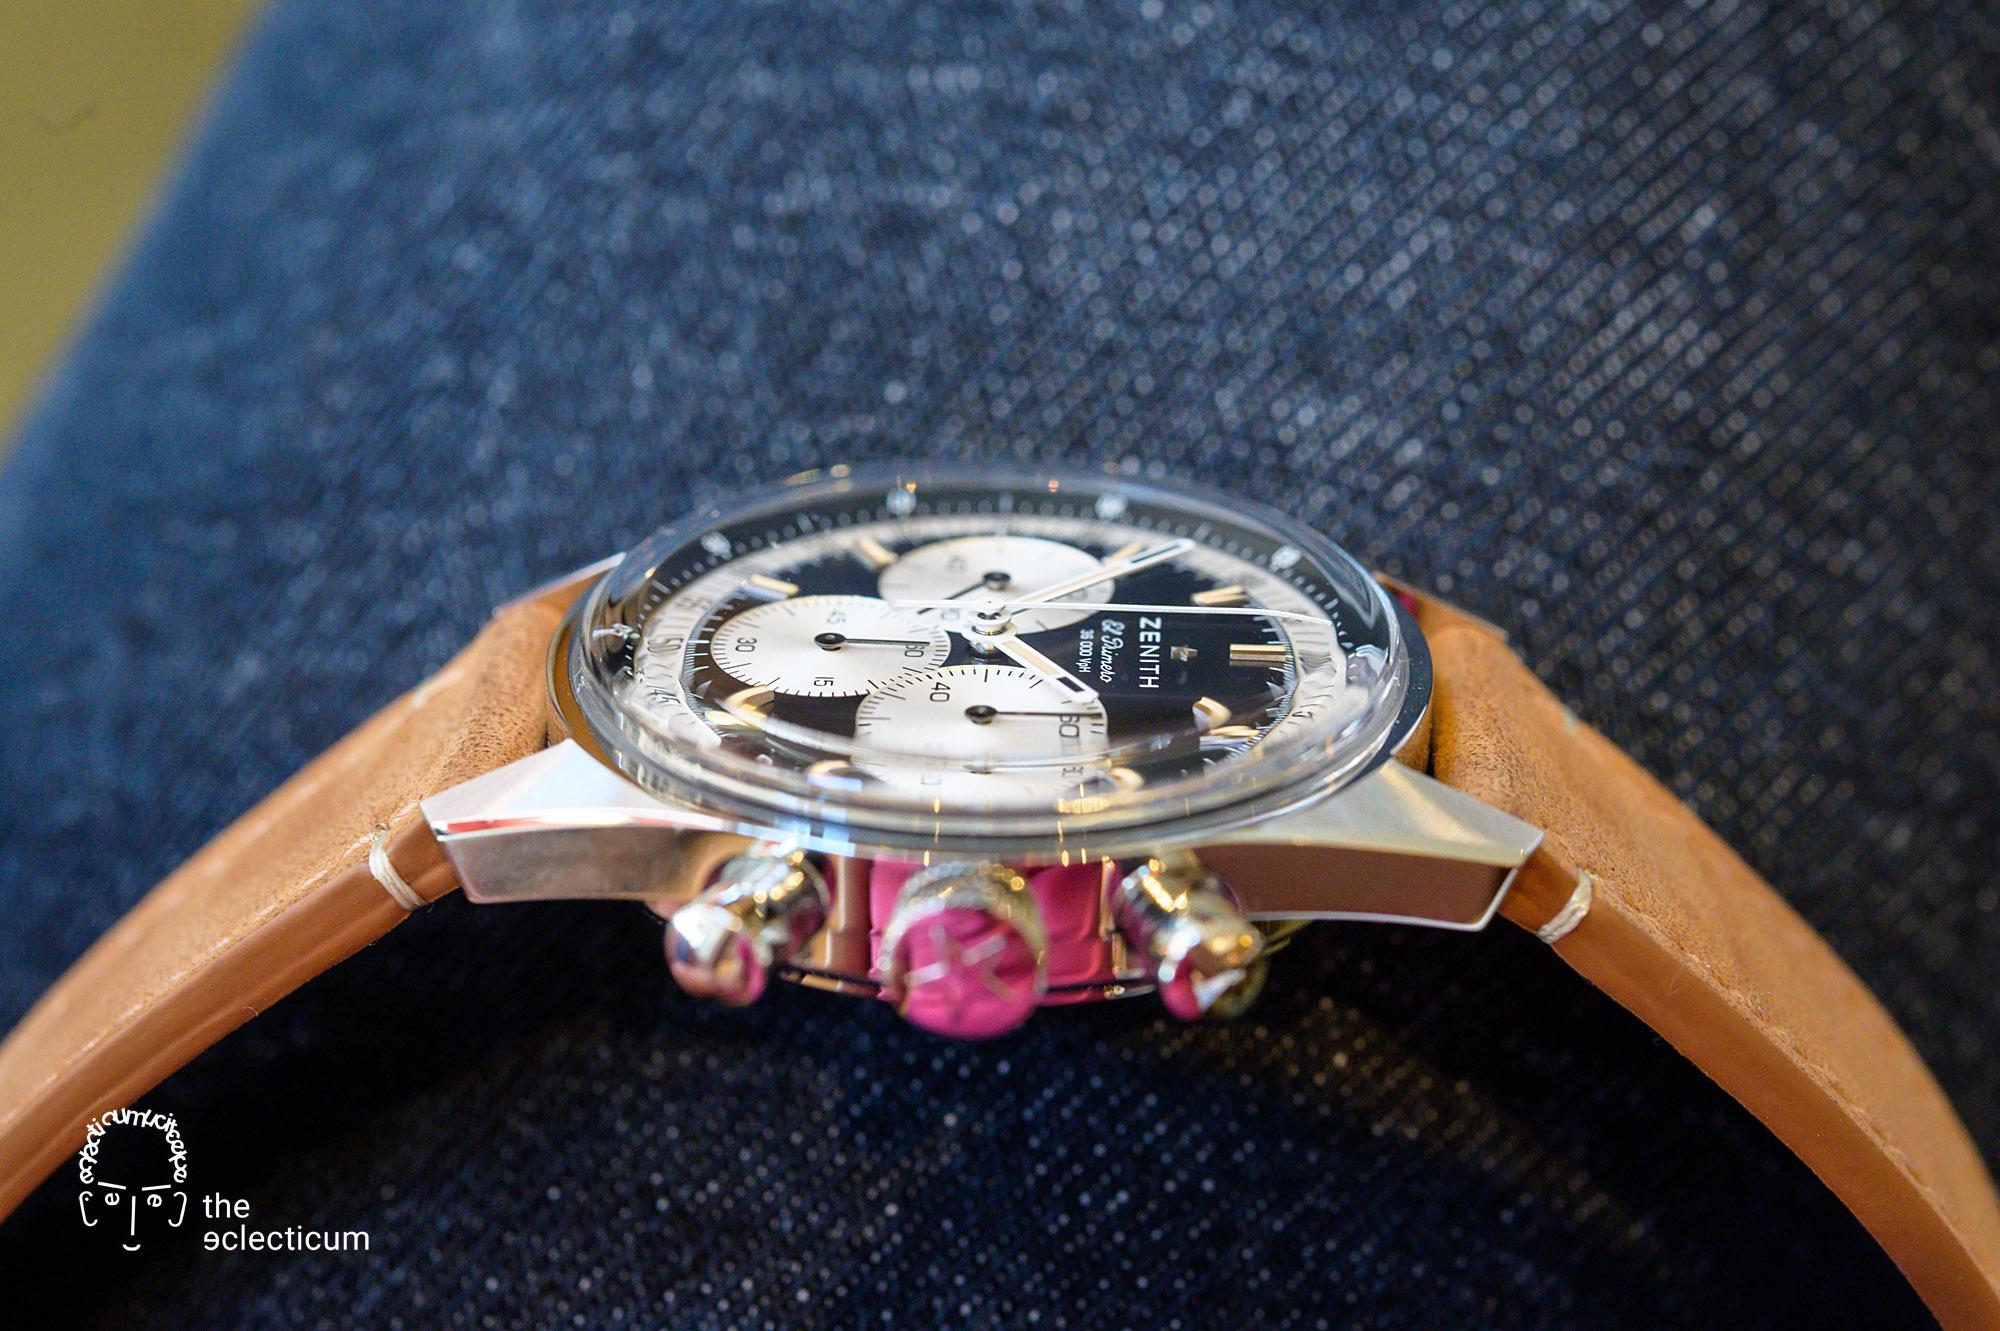 Zenith Chronomaster Original El Primero Cal. 3600 stainless steel inversed panda dial